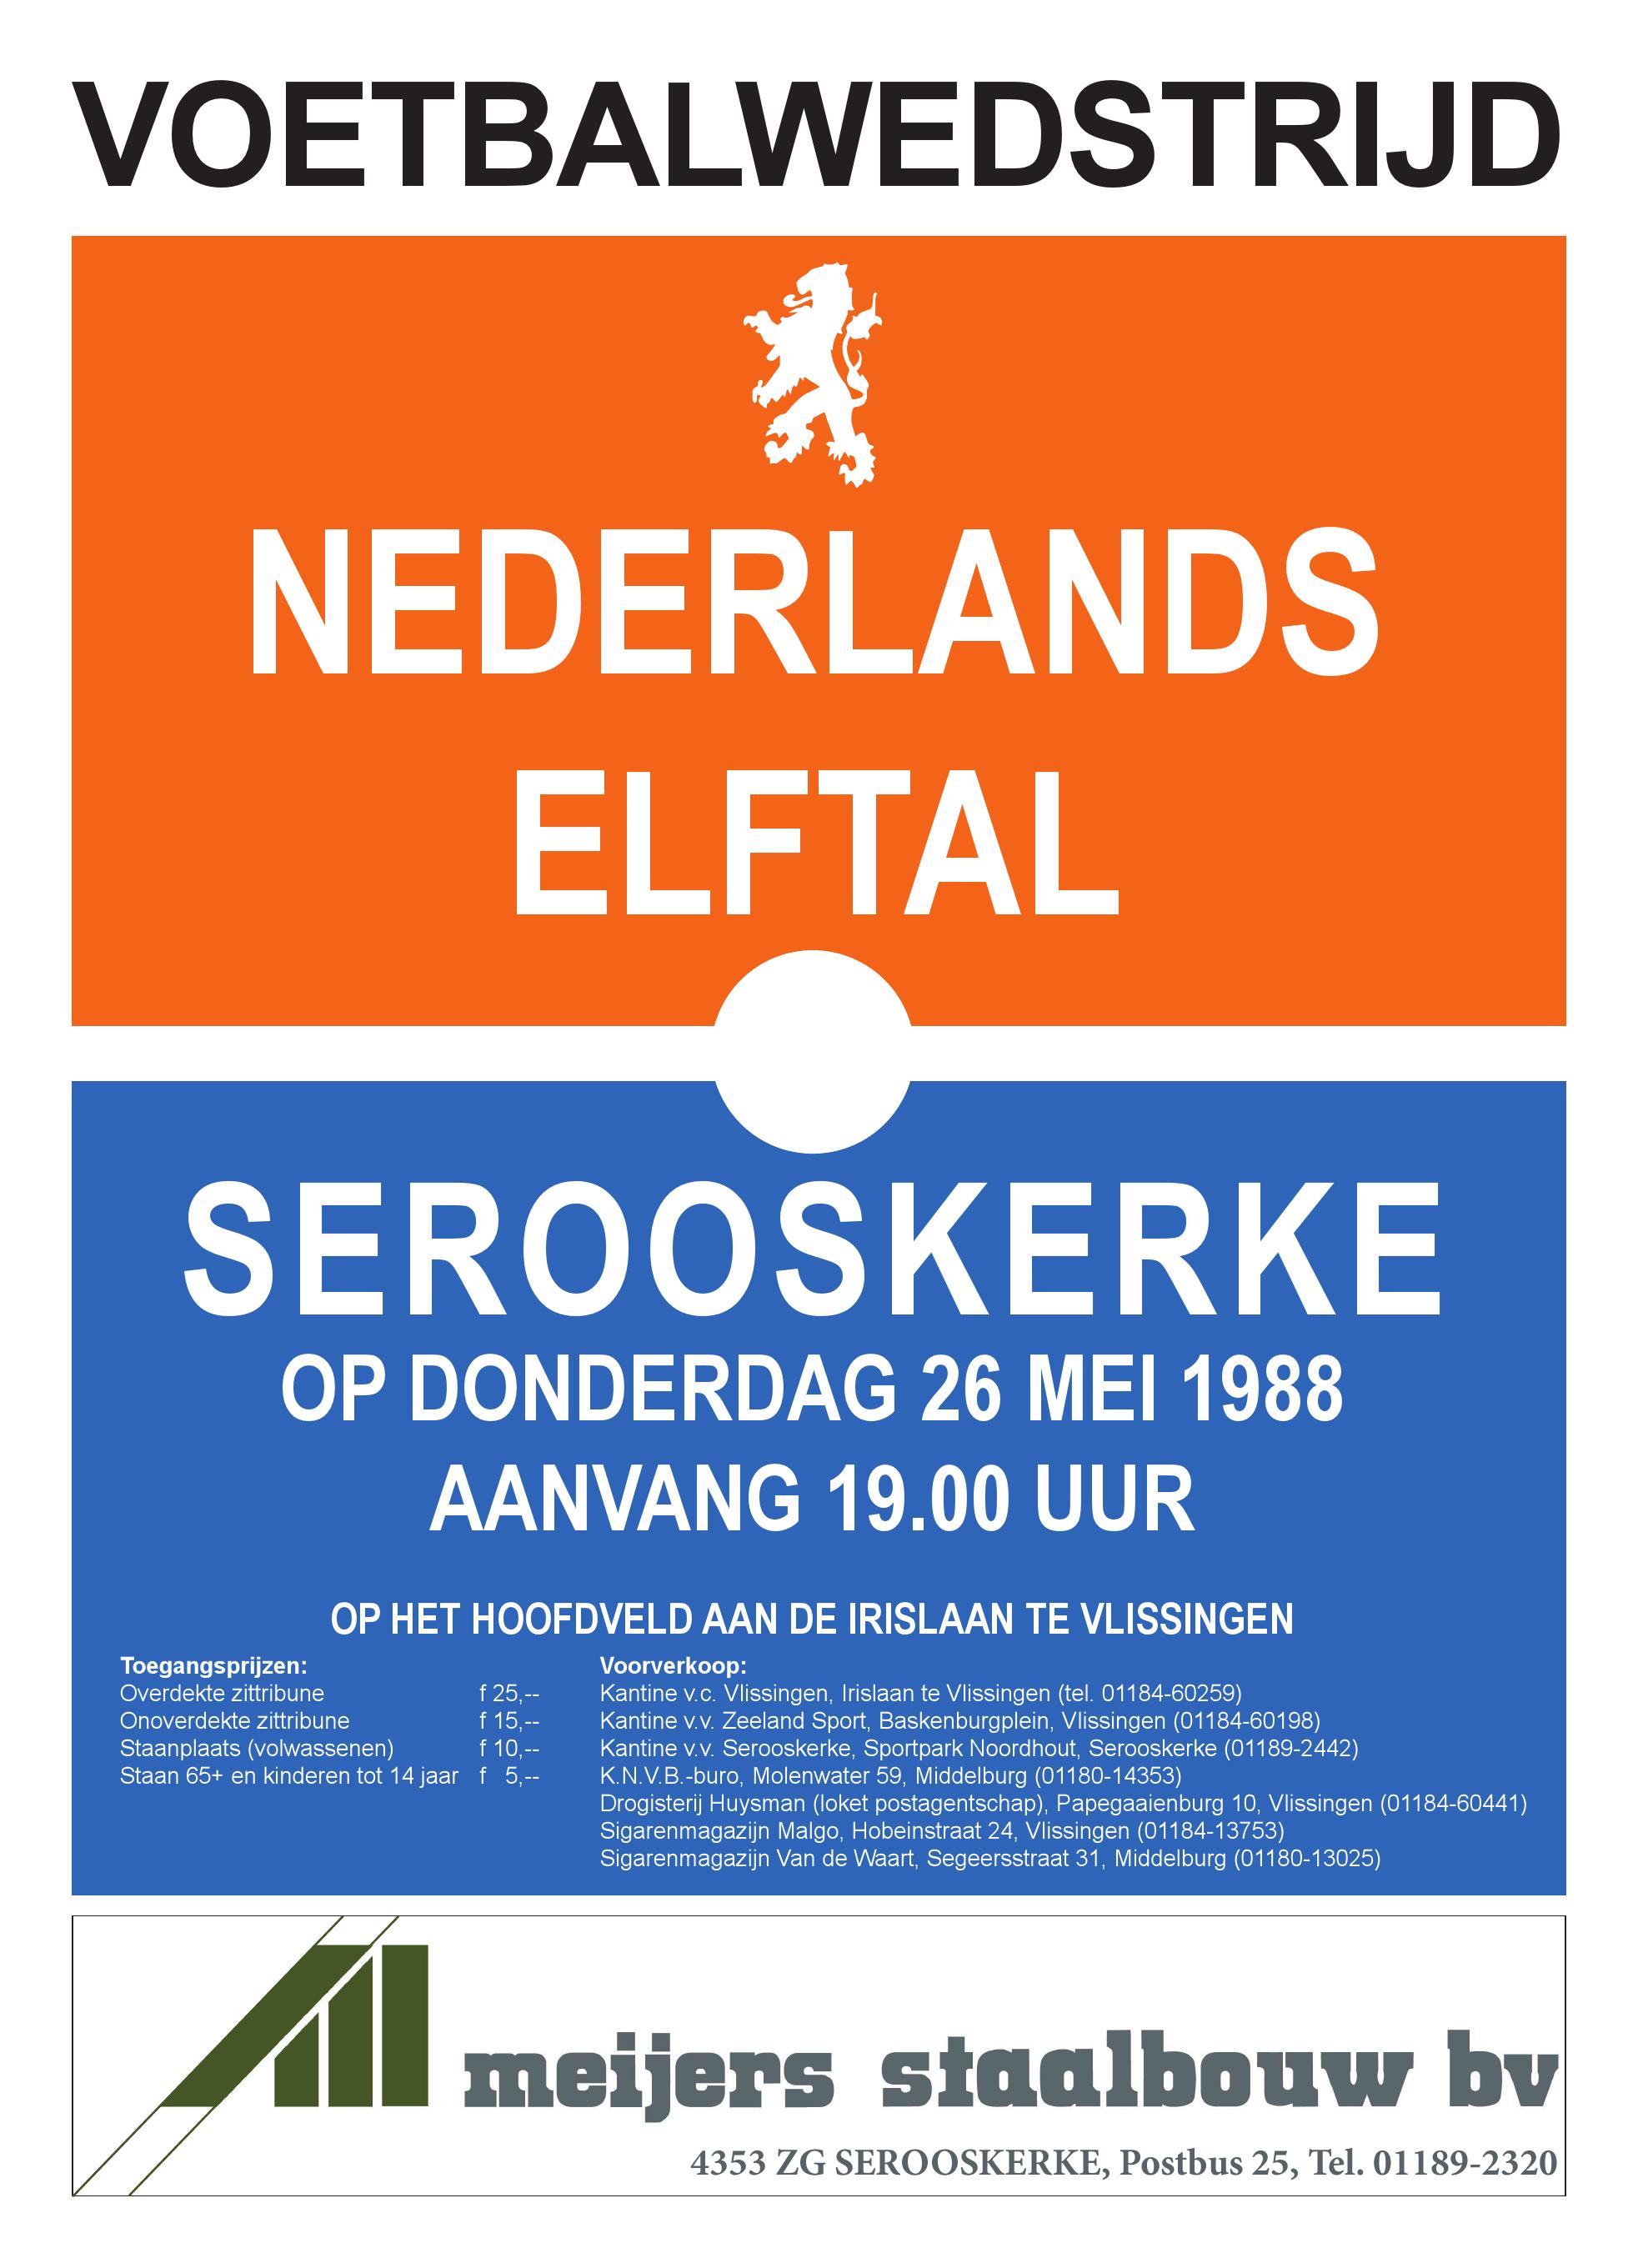 Alpe D Huzes En De Wedstrijdbal Serooskerke Nederlands Elftal 1988 Vv Serooskerke